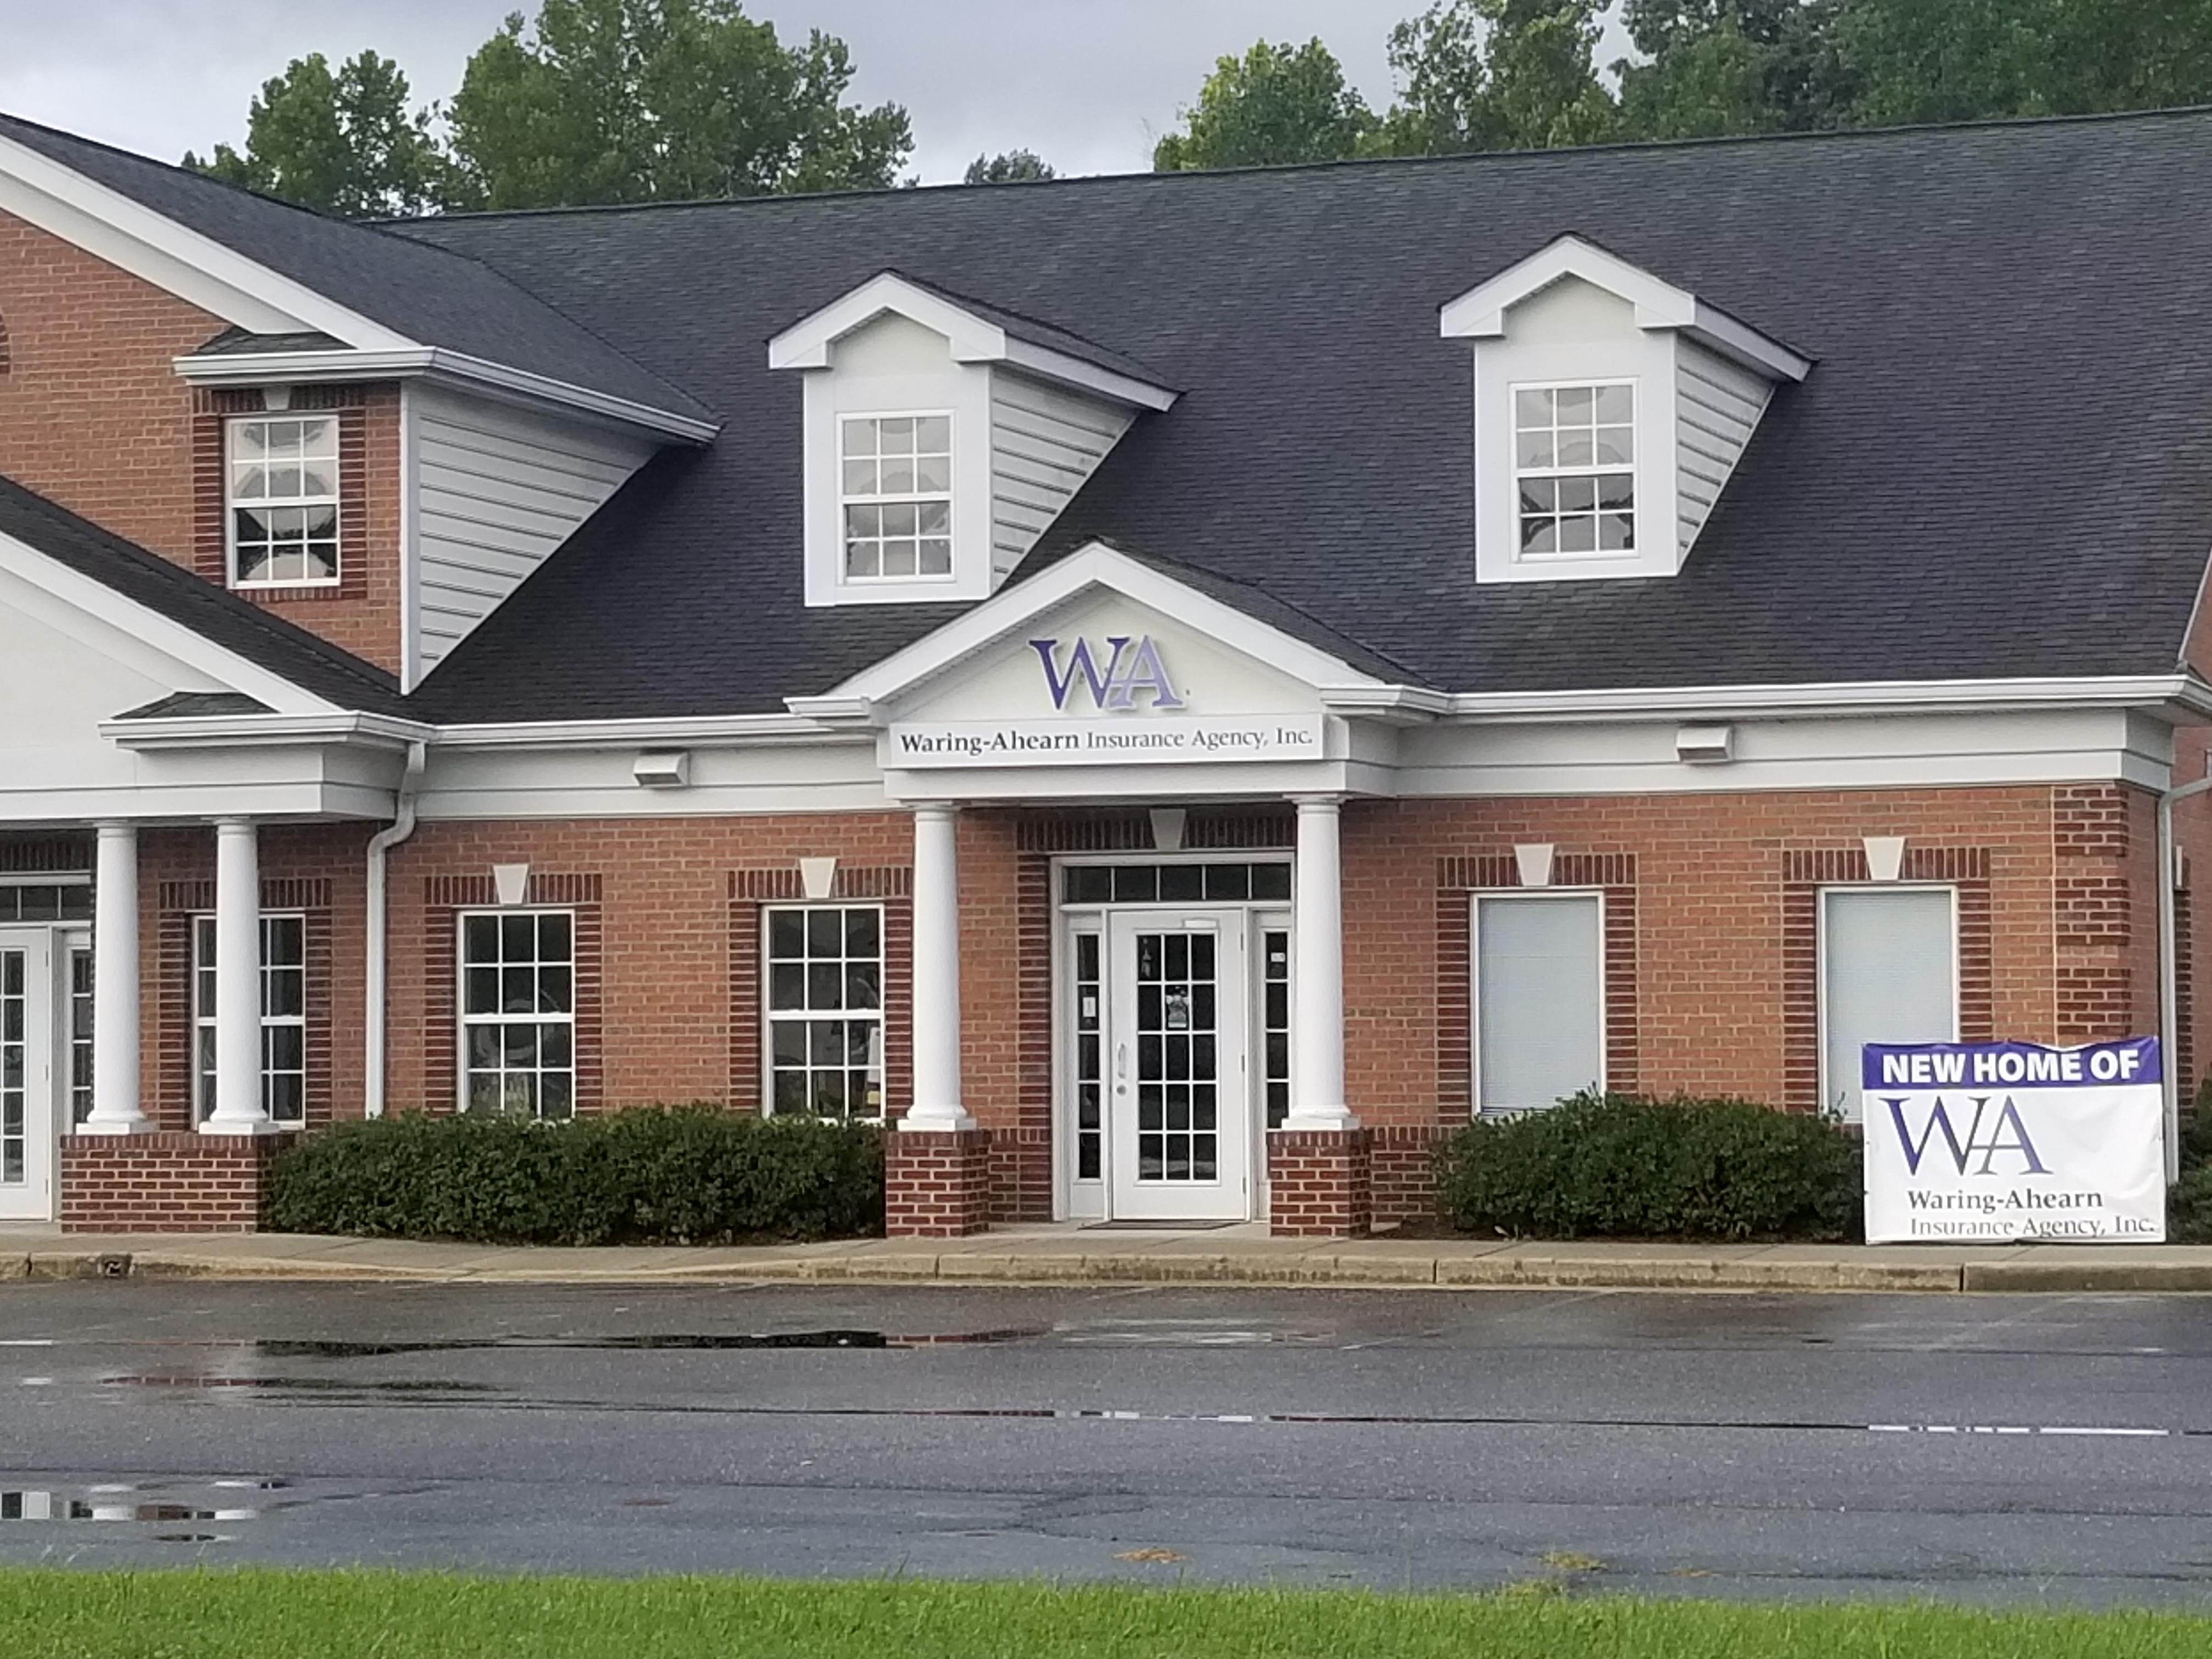 Waring-Ahearn Insurance Inc:  Jay Duke Insurance Agency